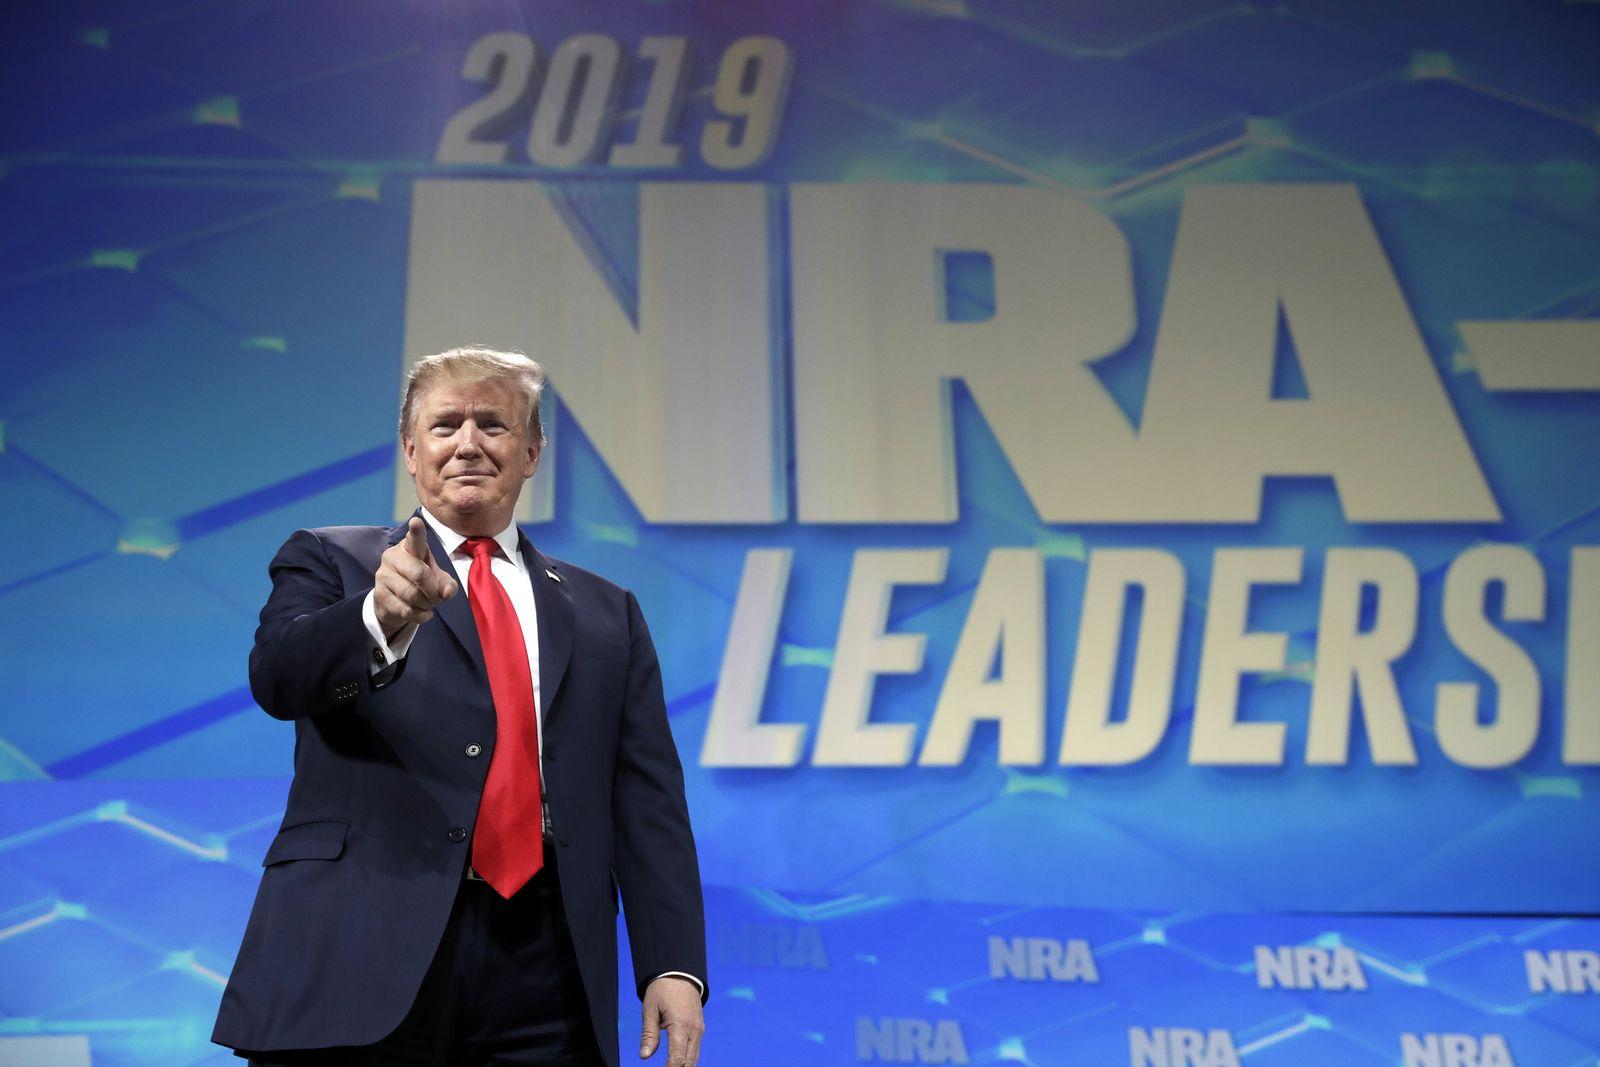 NRA Donald Trump